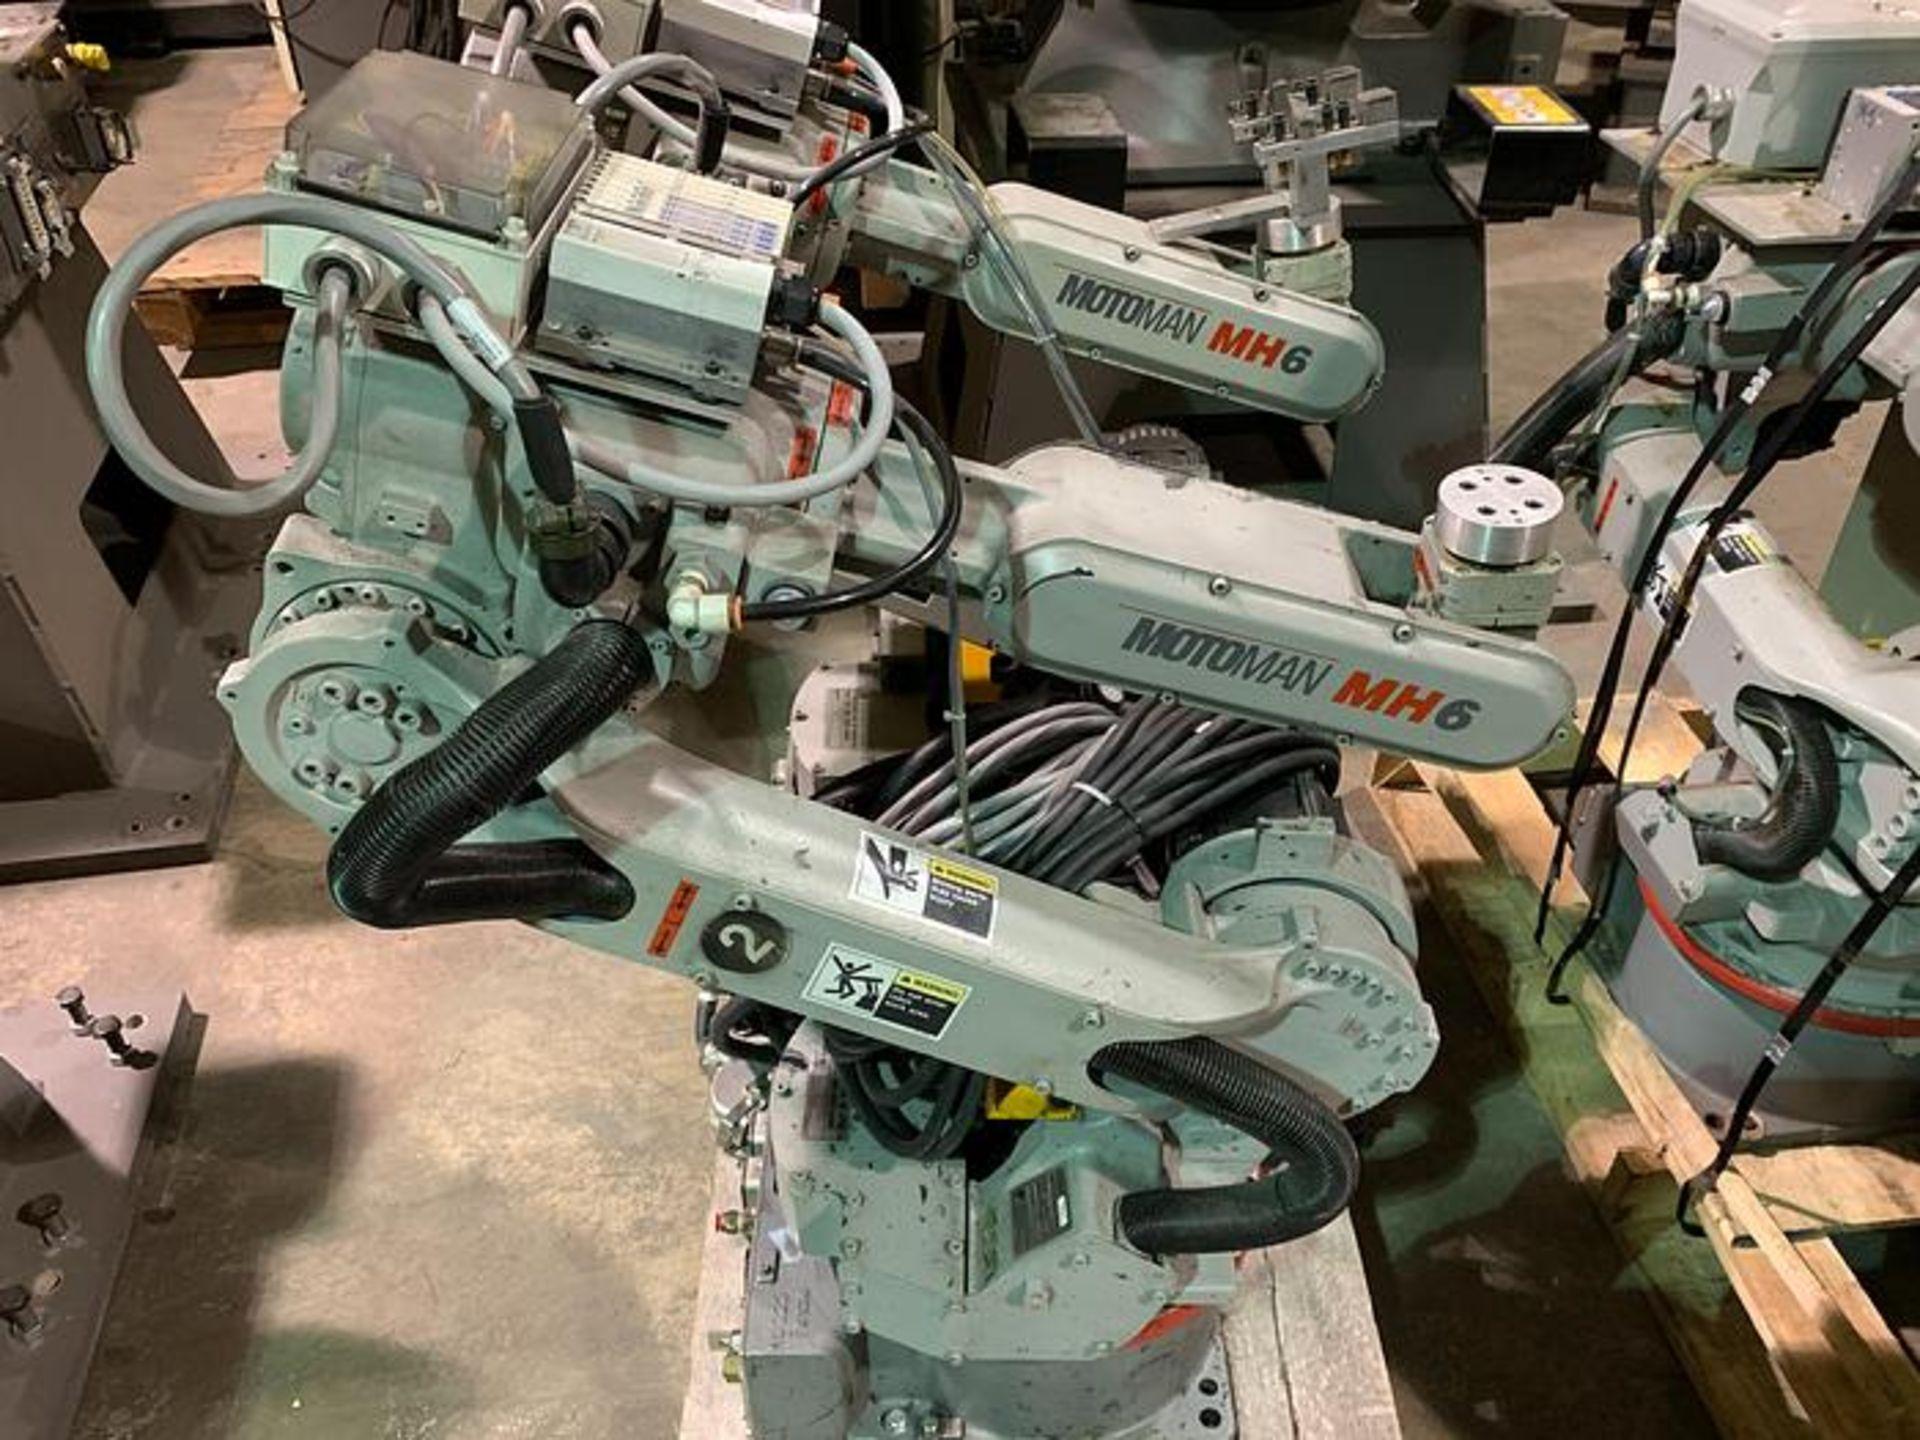 MOTOMAN ROBOT MH6 HIGH SPEED 6 AXIS ROBOT WITH DX100 CONTROLLER, CABLES & TEACH, SN S86C95-1-1